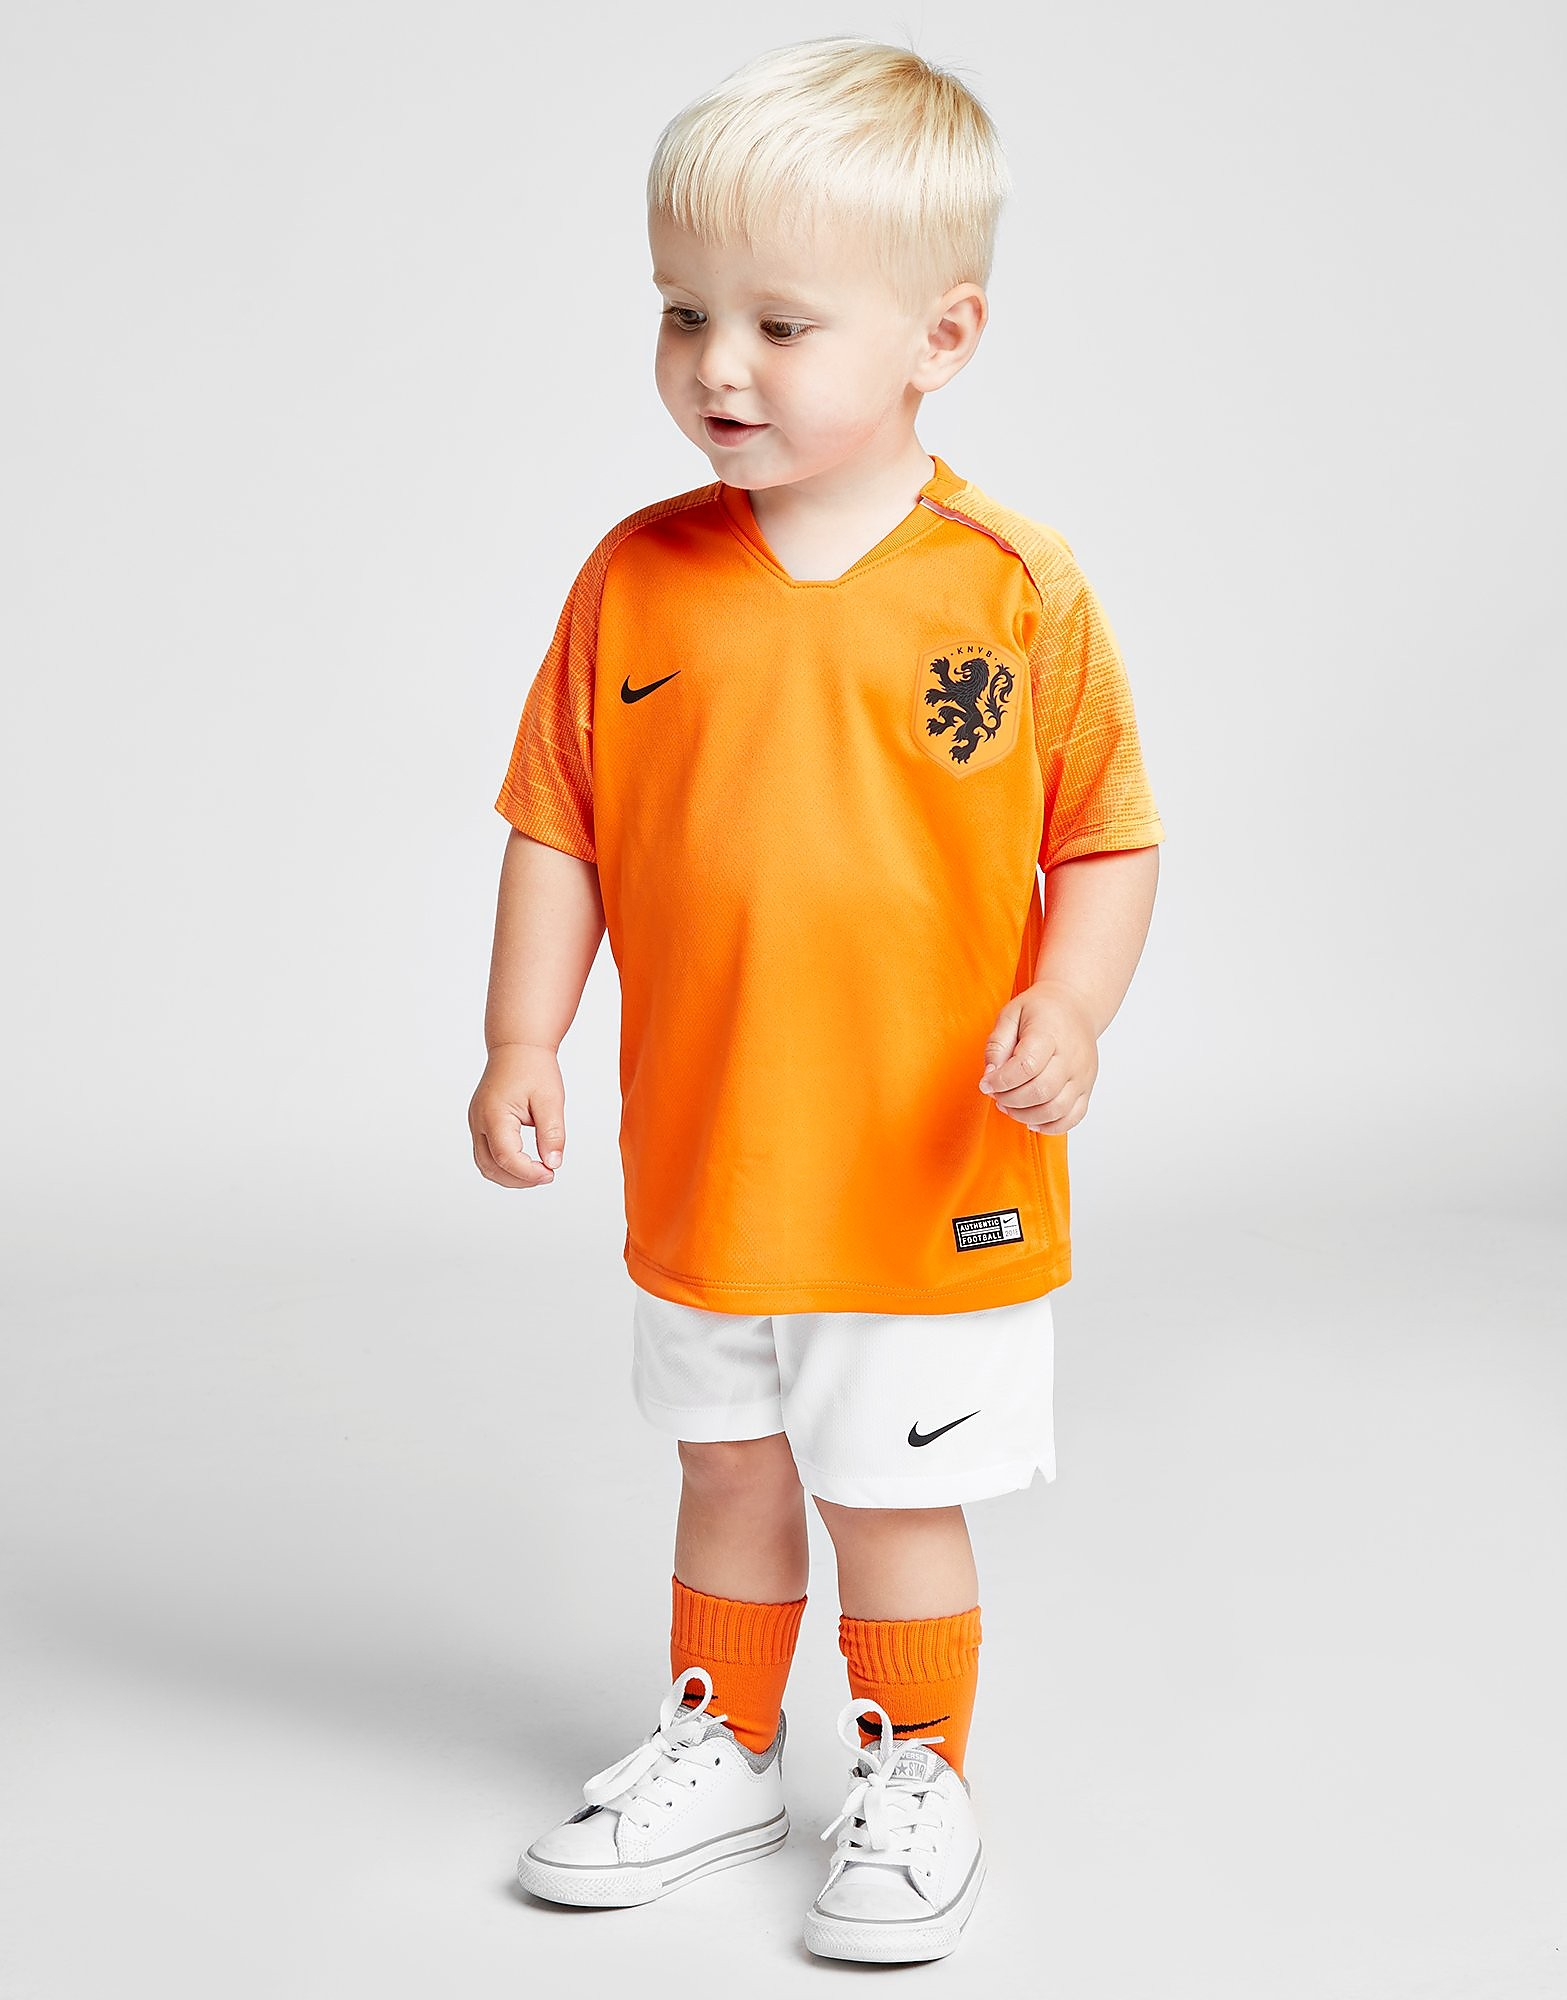 Nike Holland 2018 Home Kit Infant PRE ORDER